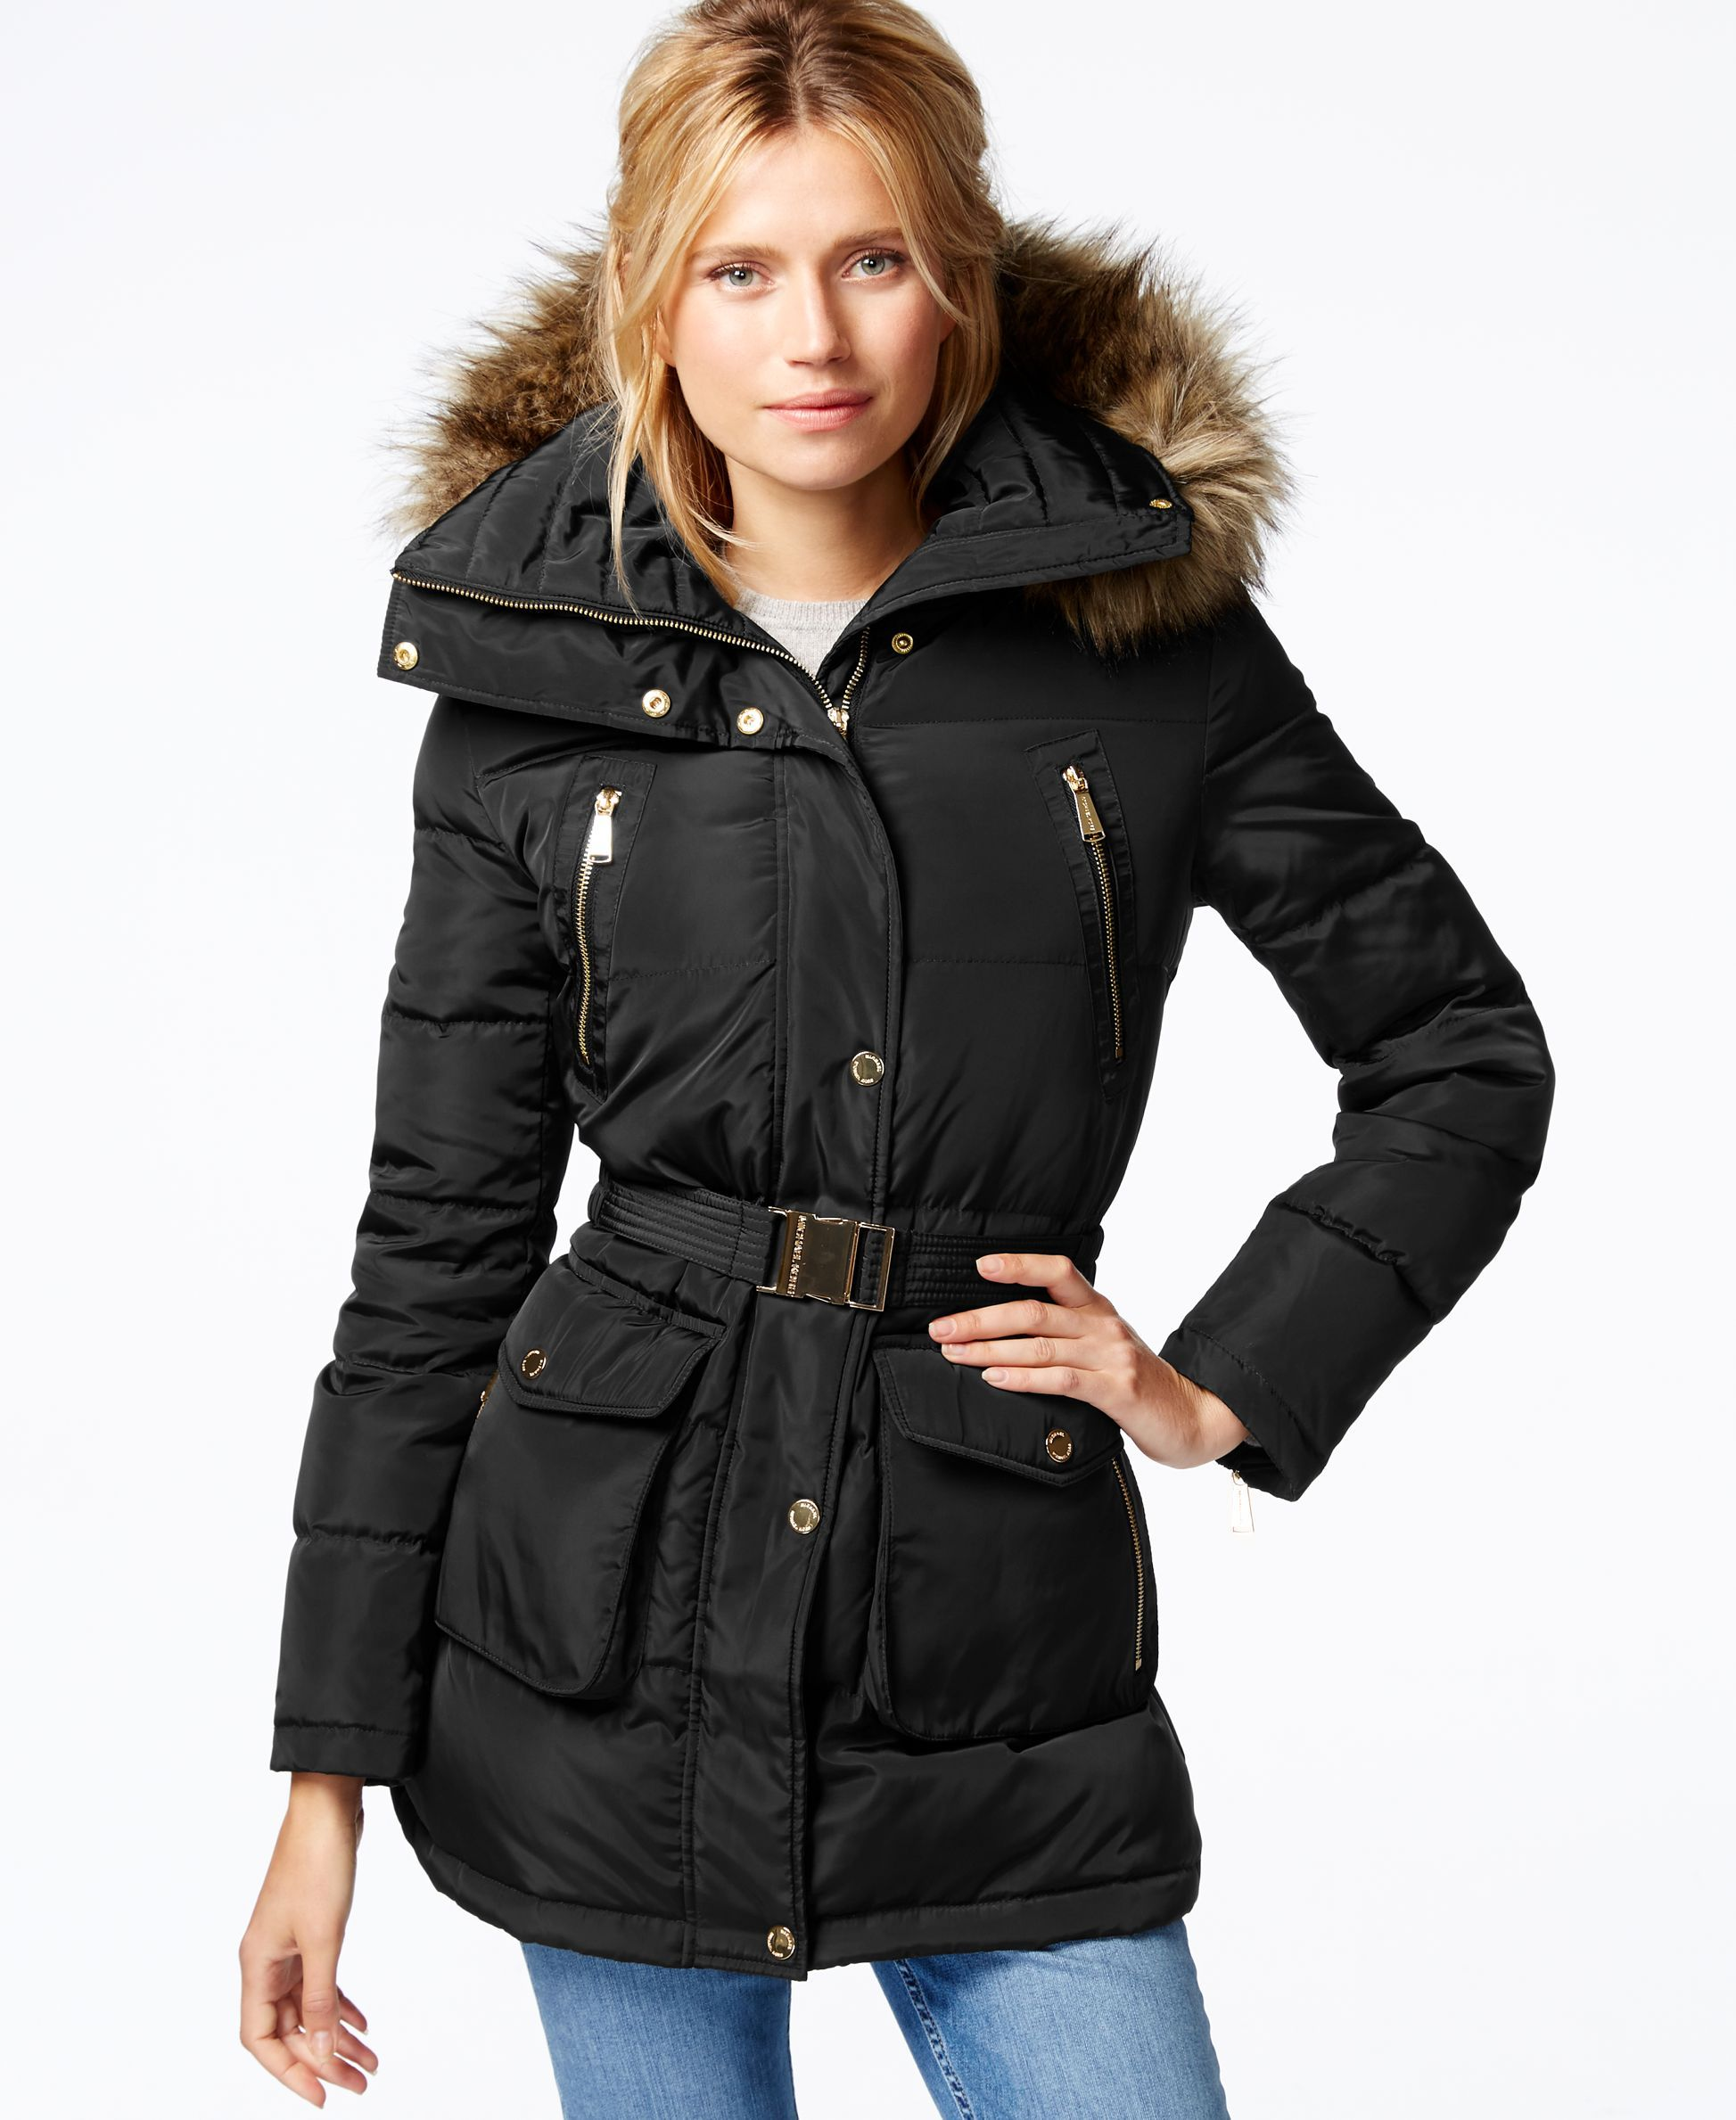 8dde8db6a91c MICHAEL Michael Kors Faux-Fur-Trim Belted Coat - Coats - Women - Macy s